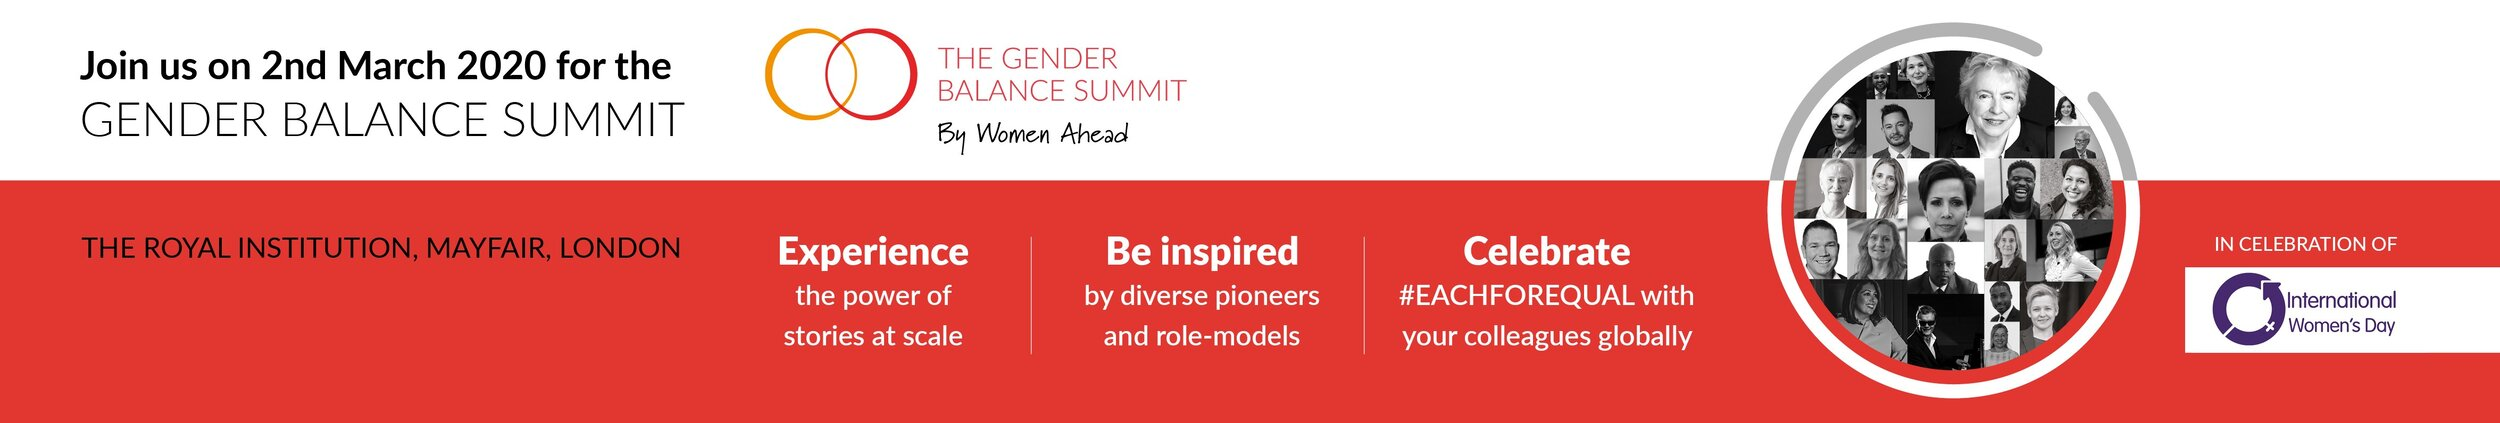 Gender Balance Summit Women Ahead